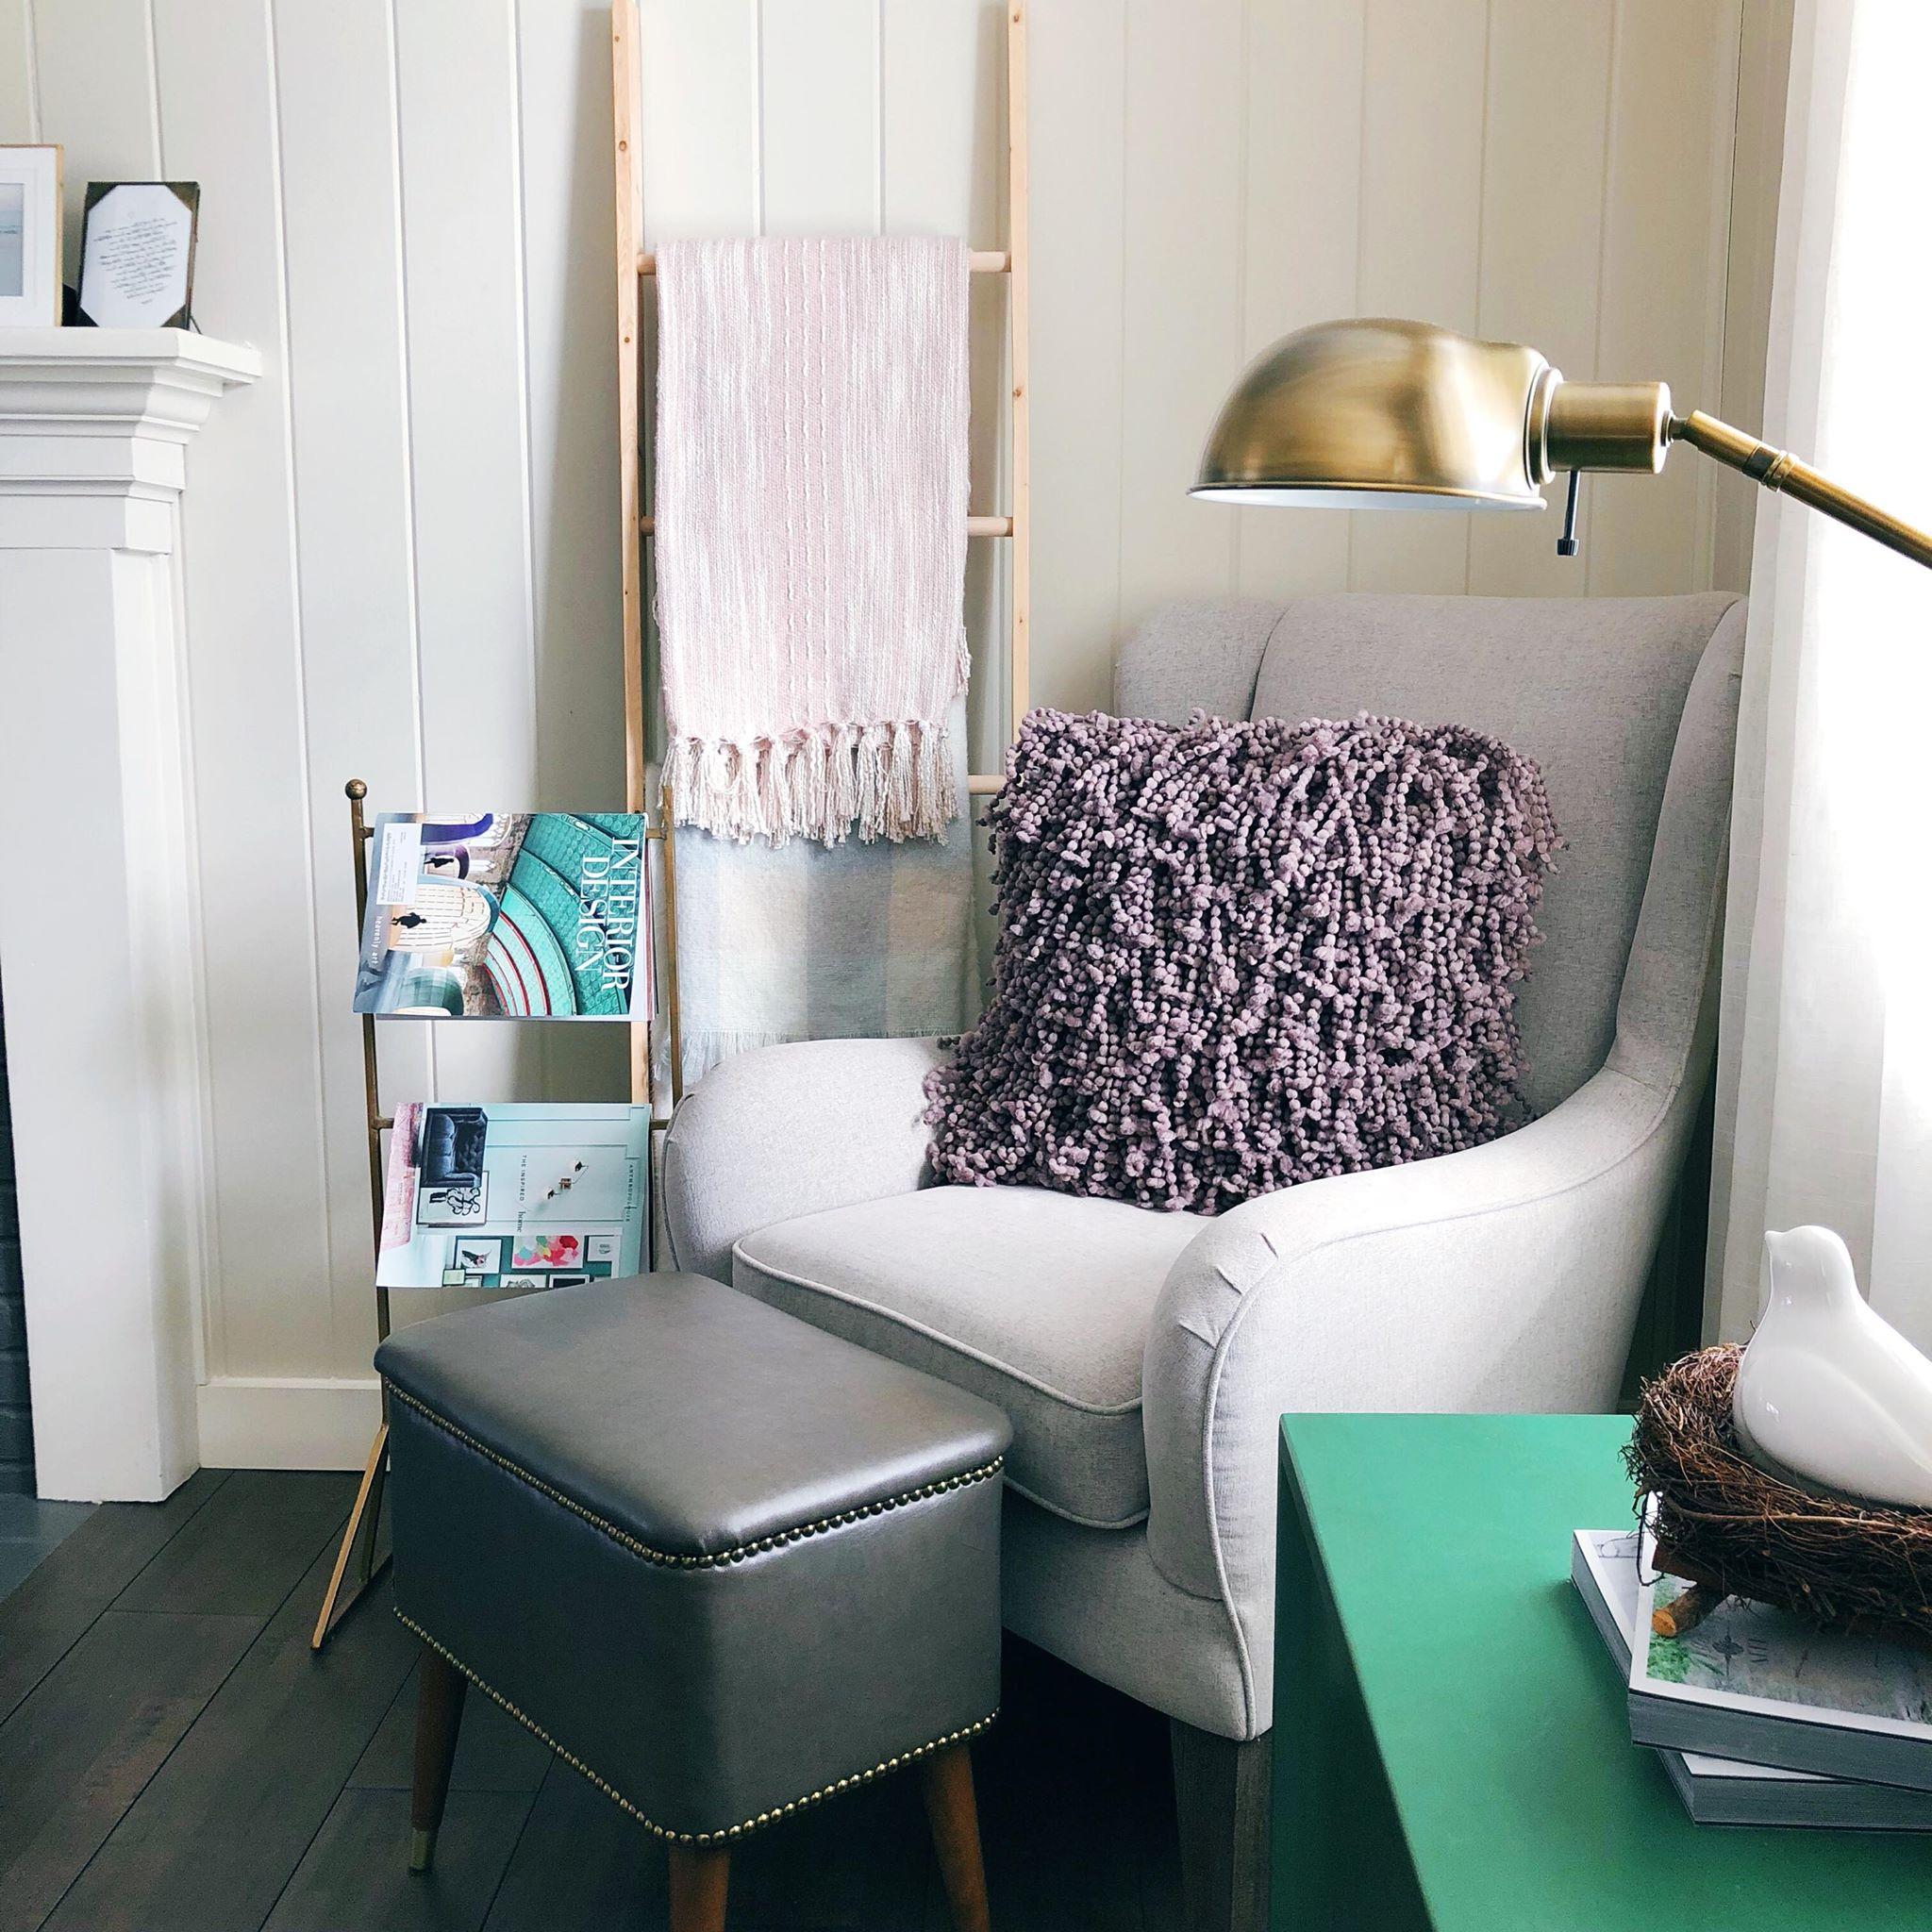 7180 Lorette Wingback Chair, Kristen Ruhe.  A Prettier Place